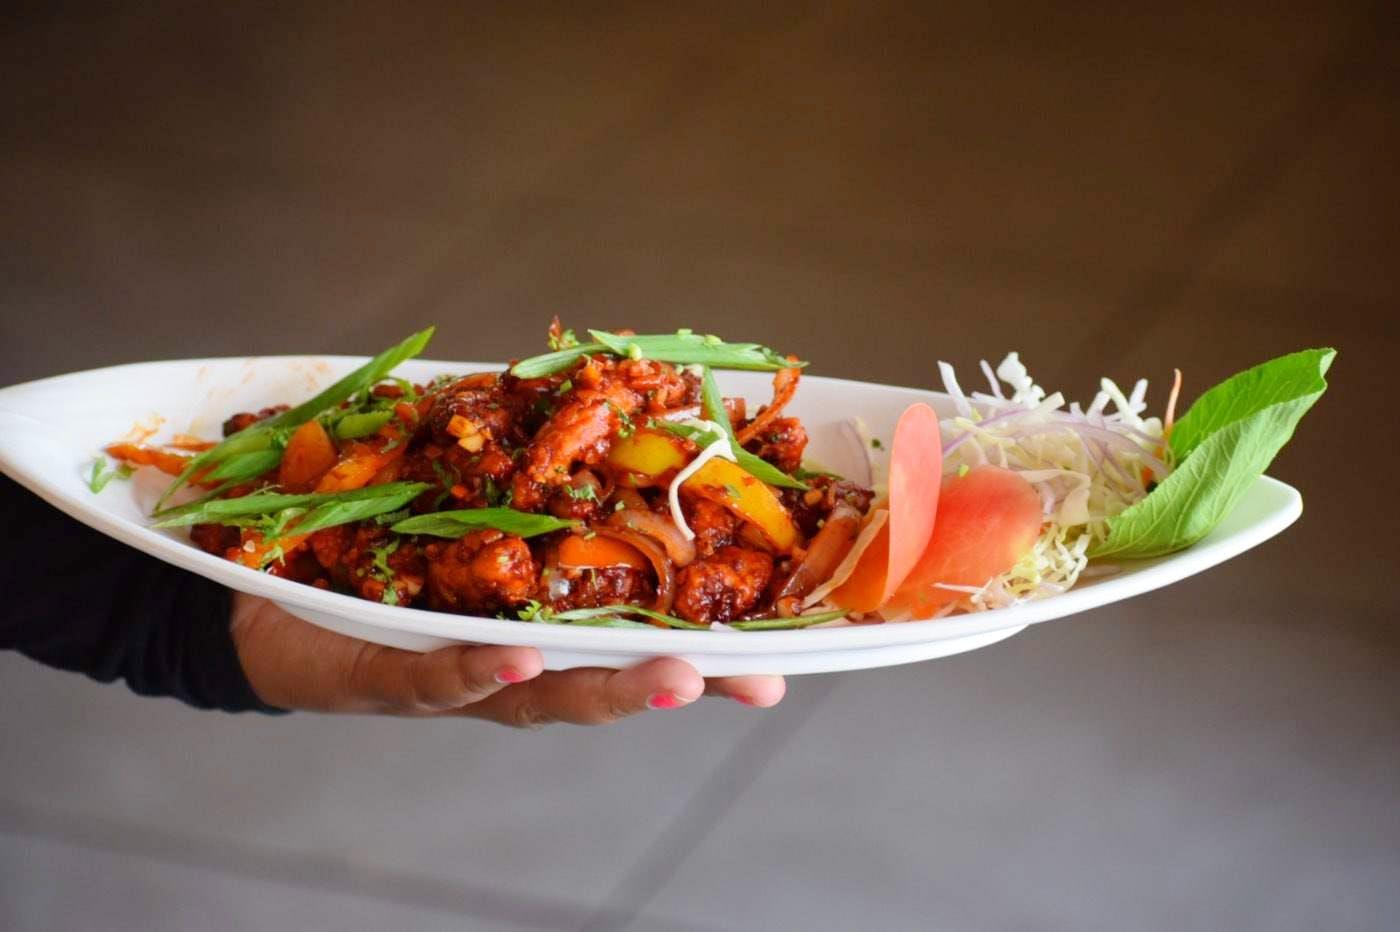 Dish,Cuisine,Food,Ingredient,Salad,Produce,Meat,Recipe,Nộm,Twice cooked pork